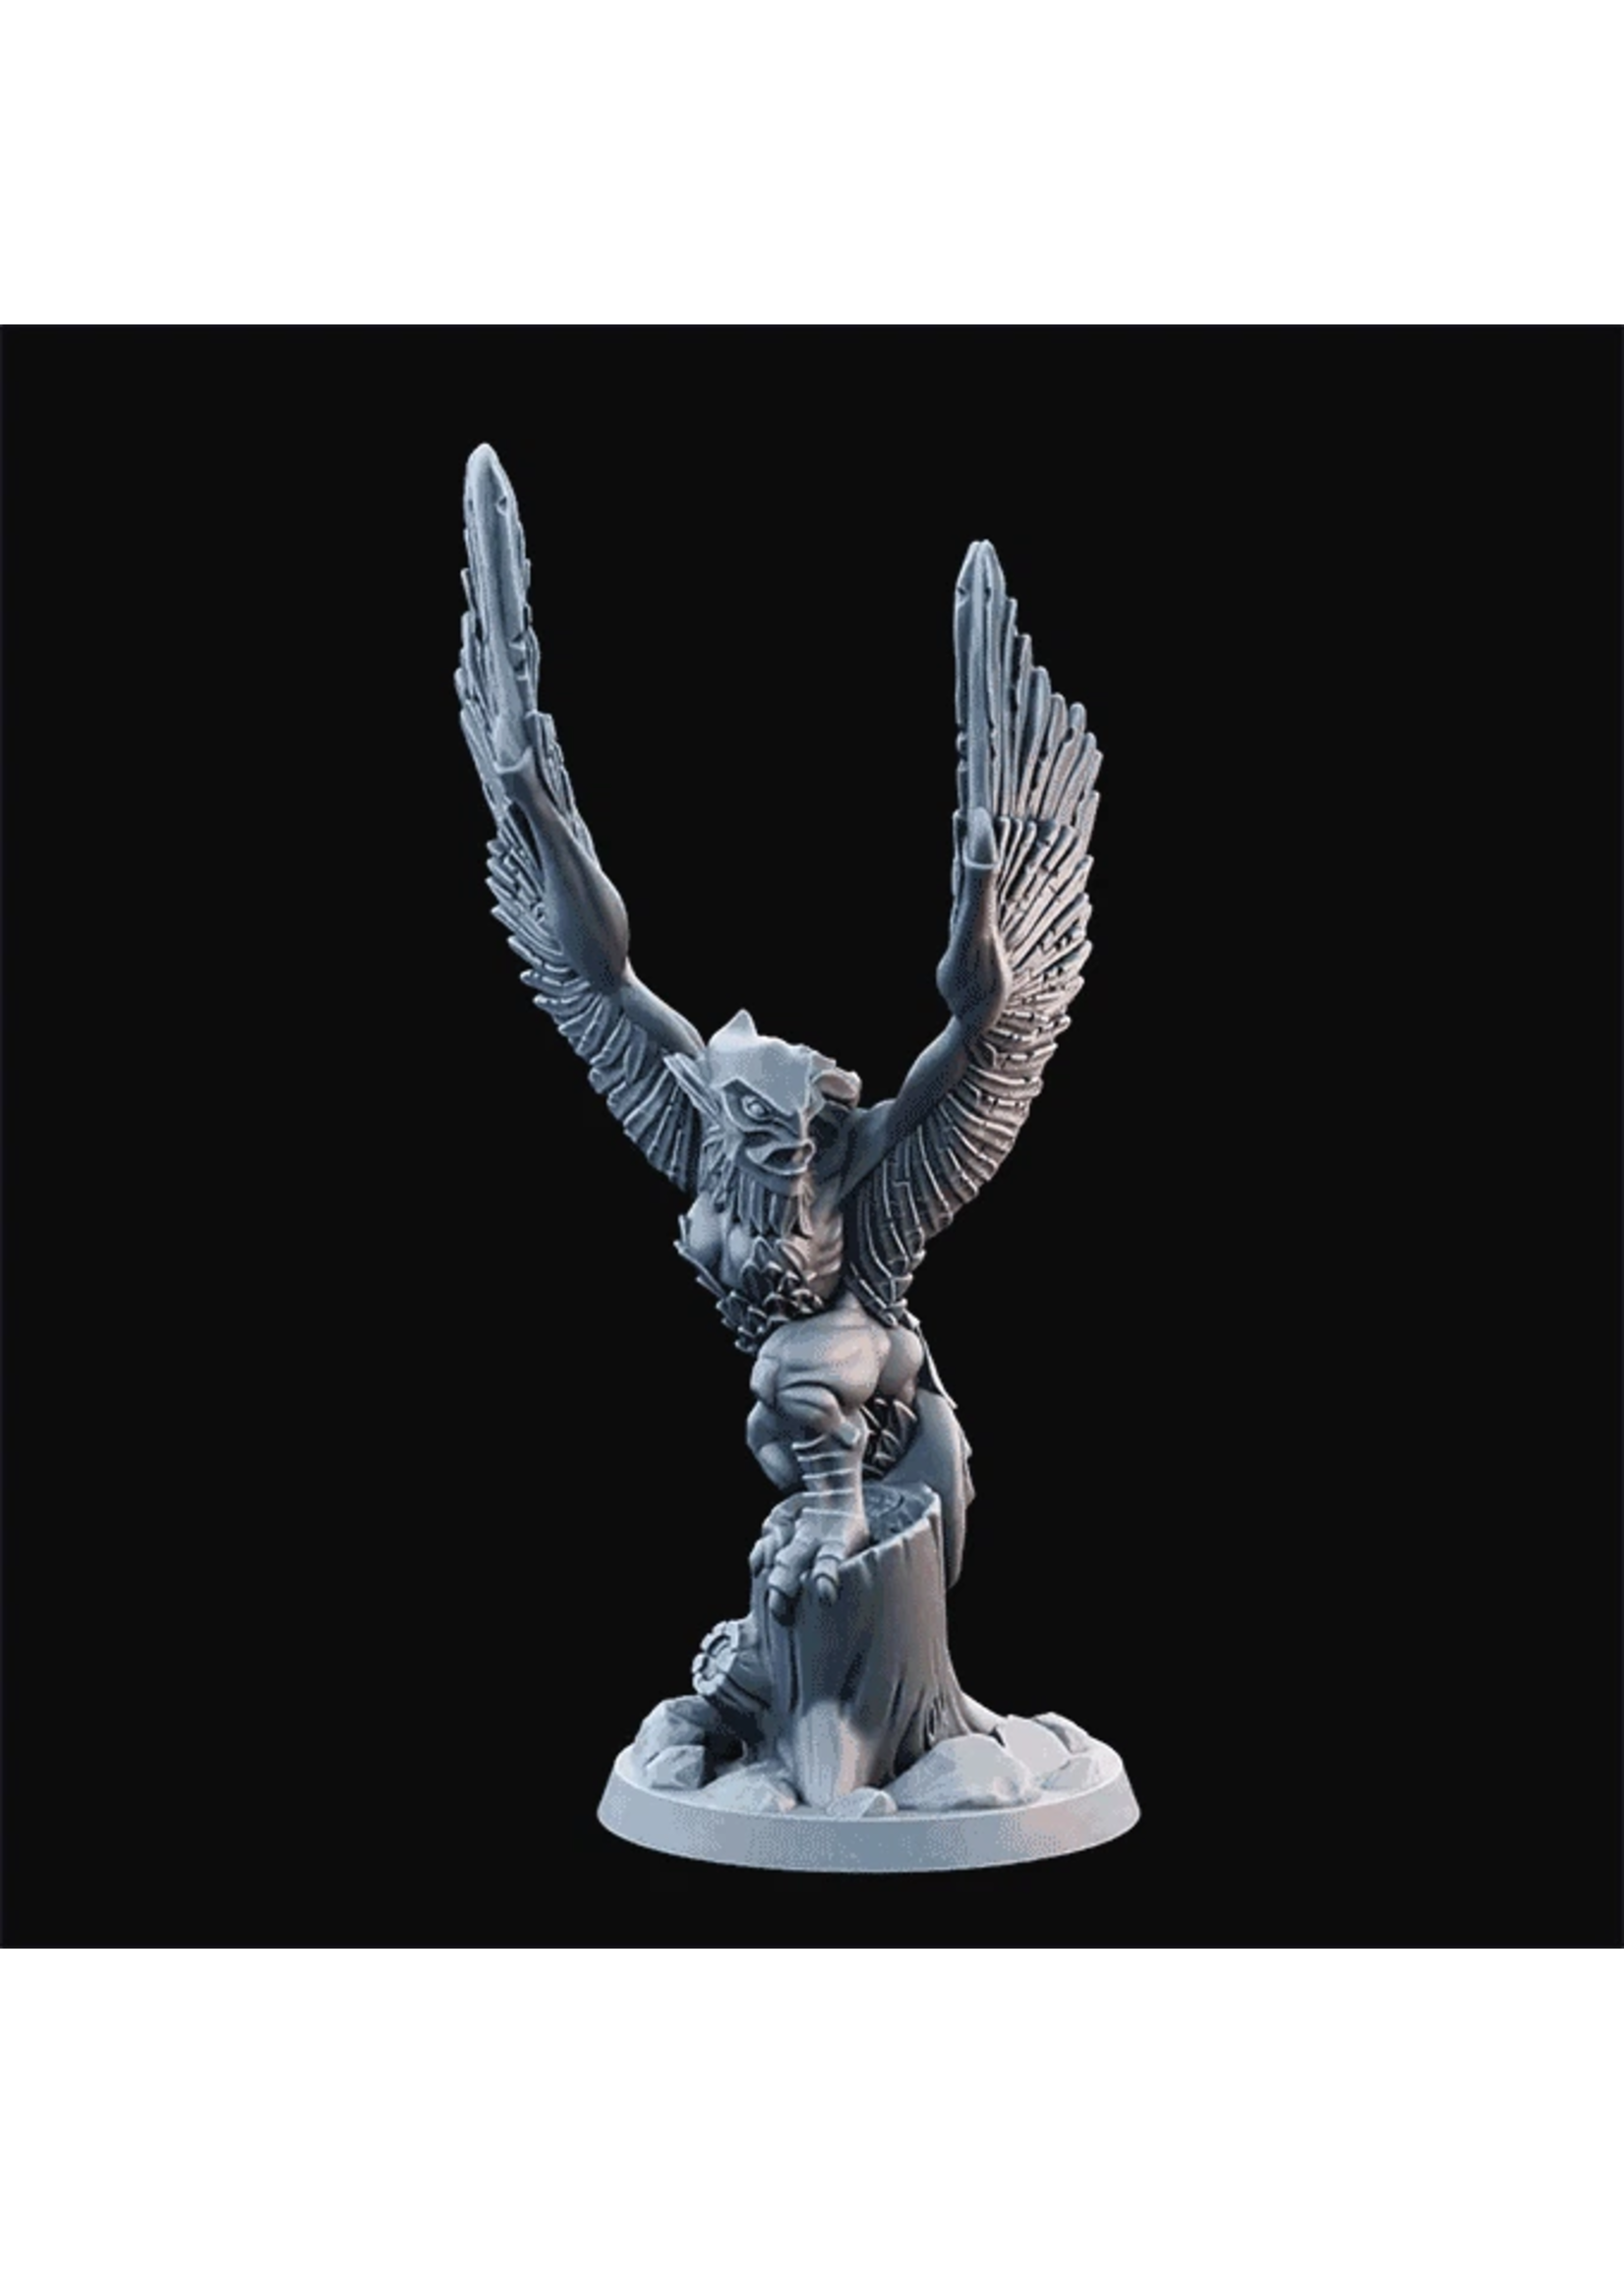 3D Printed Miniature - Harpy02  - Dungeons & Dragons - Desolate Plains KS